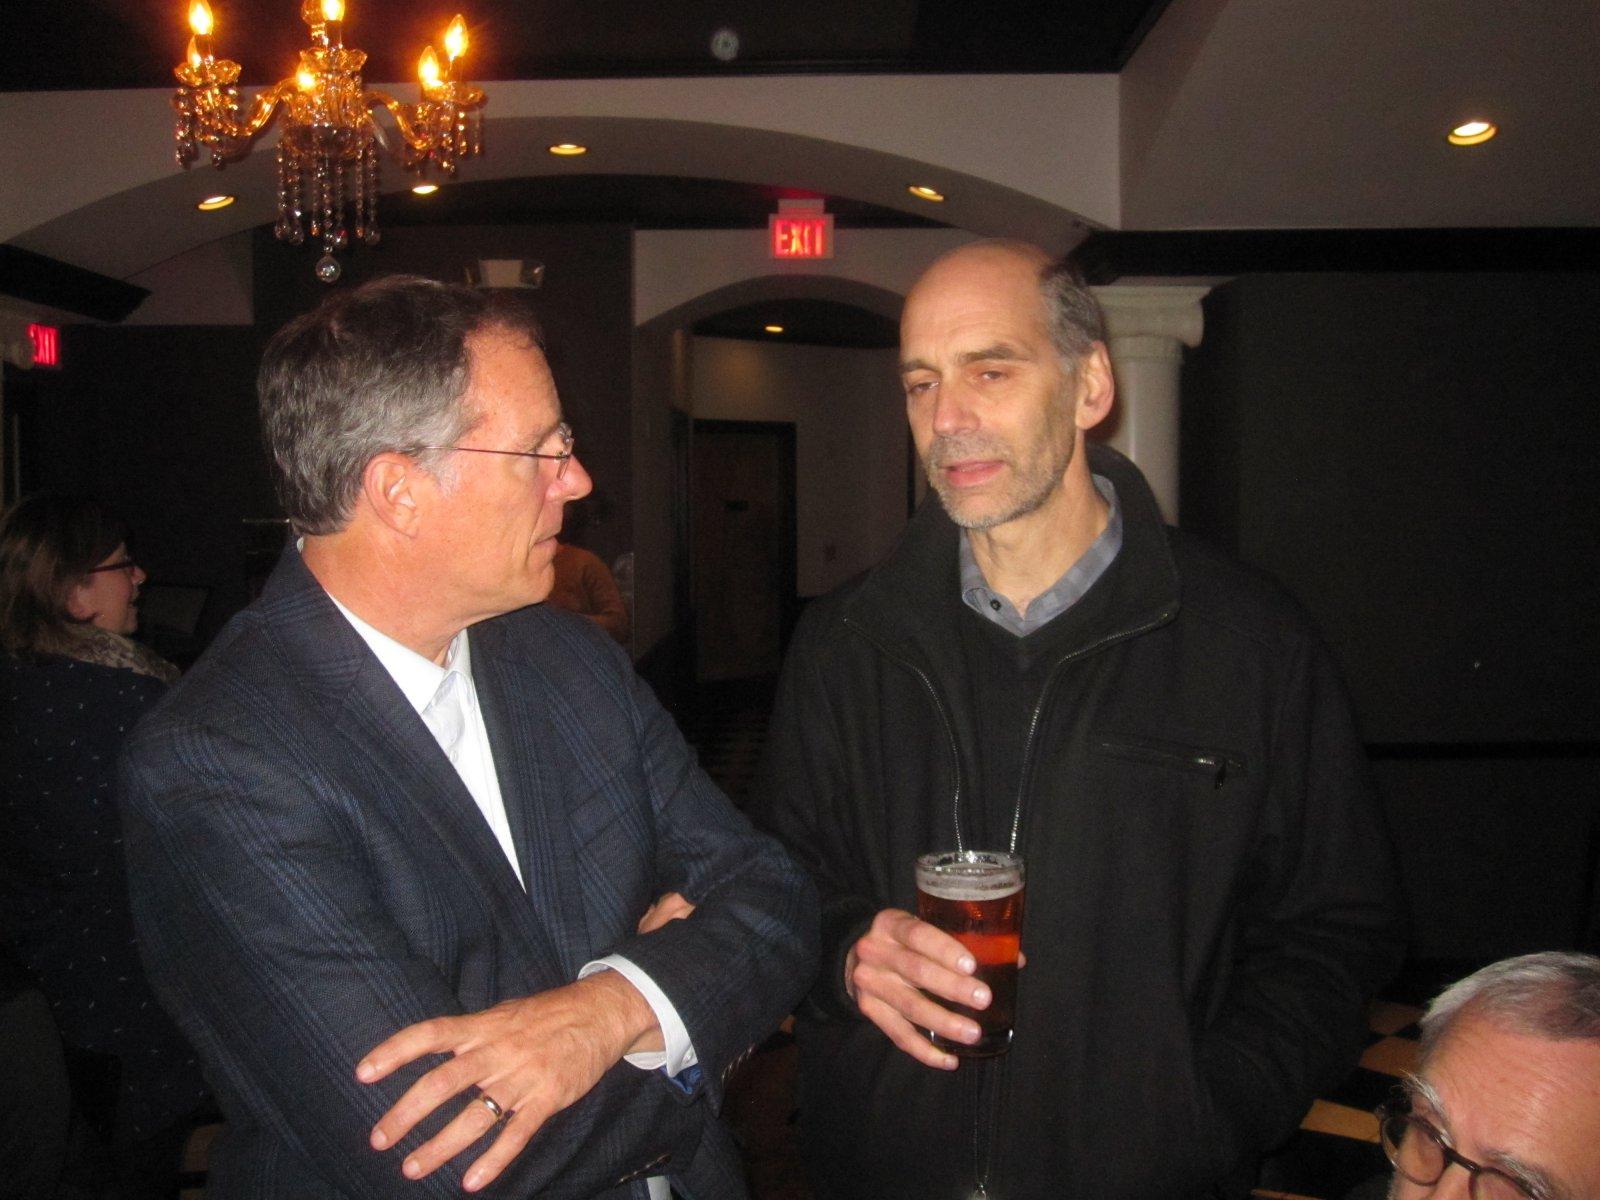 Jon Richards and Russ Drewry